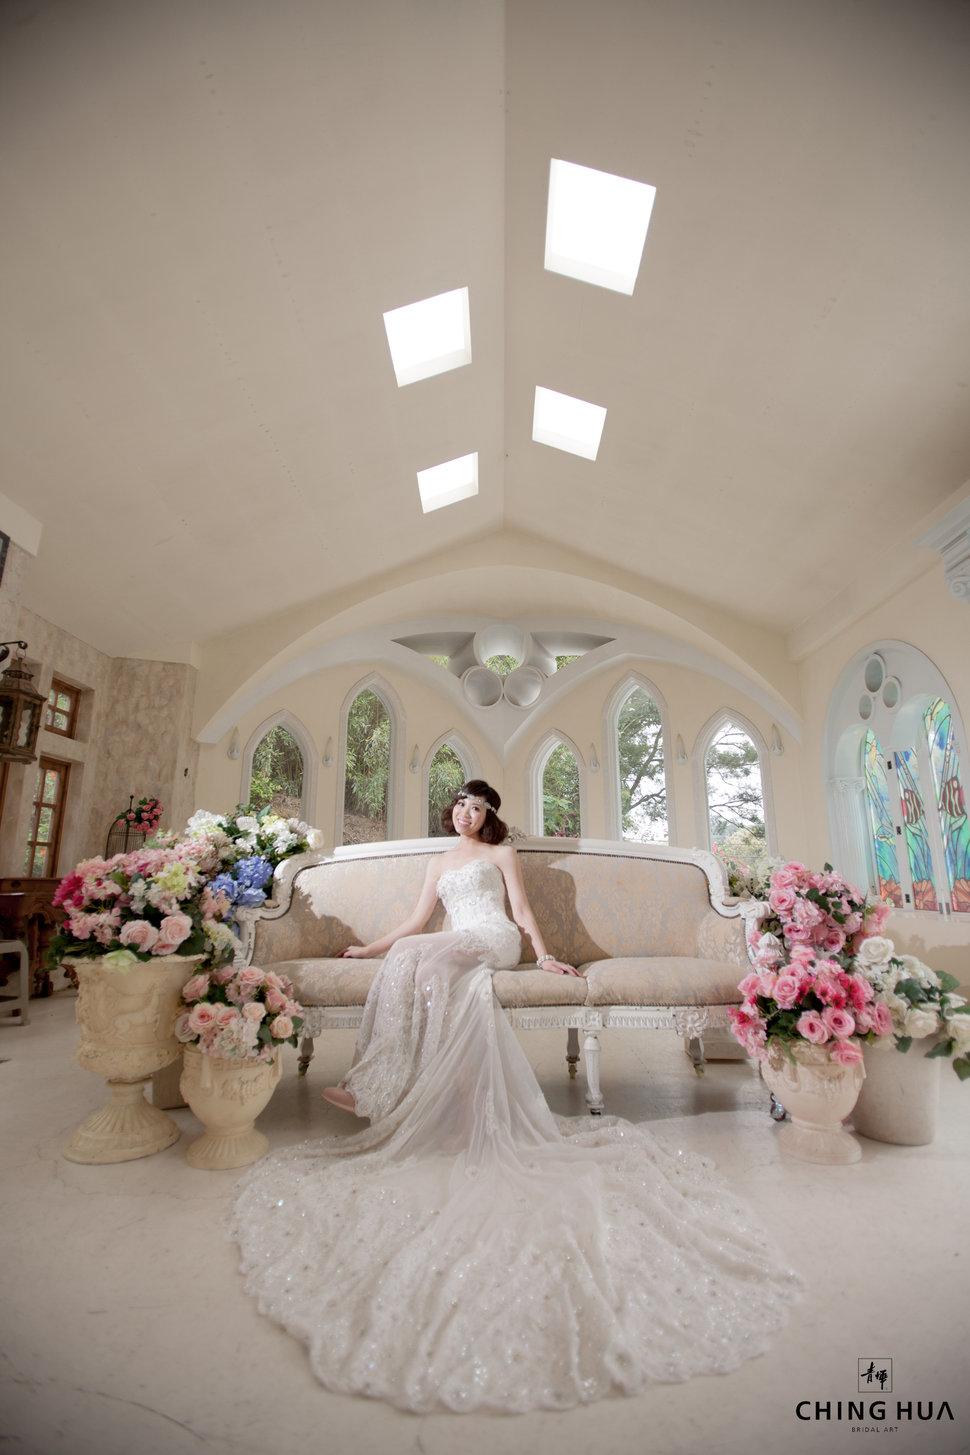 (編號:376891) - 青樺婚紗CHINGHUA - 結婚吧